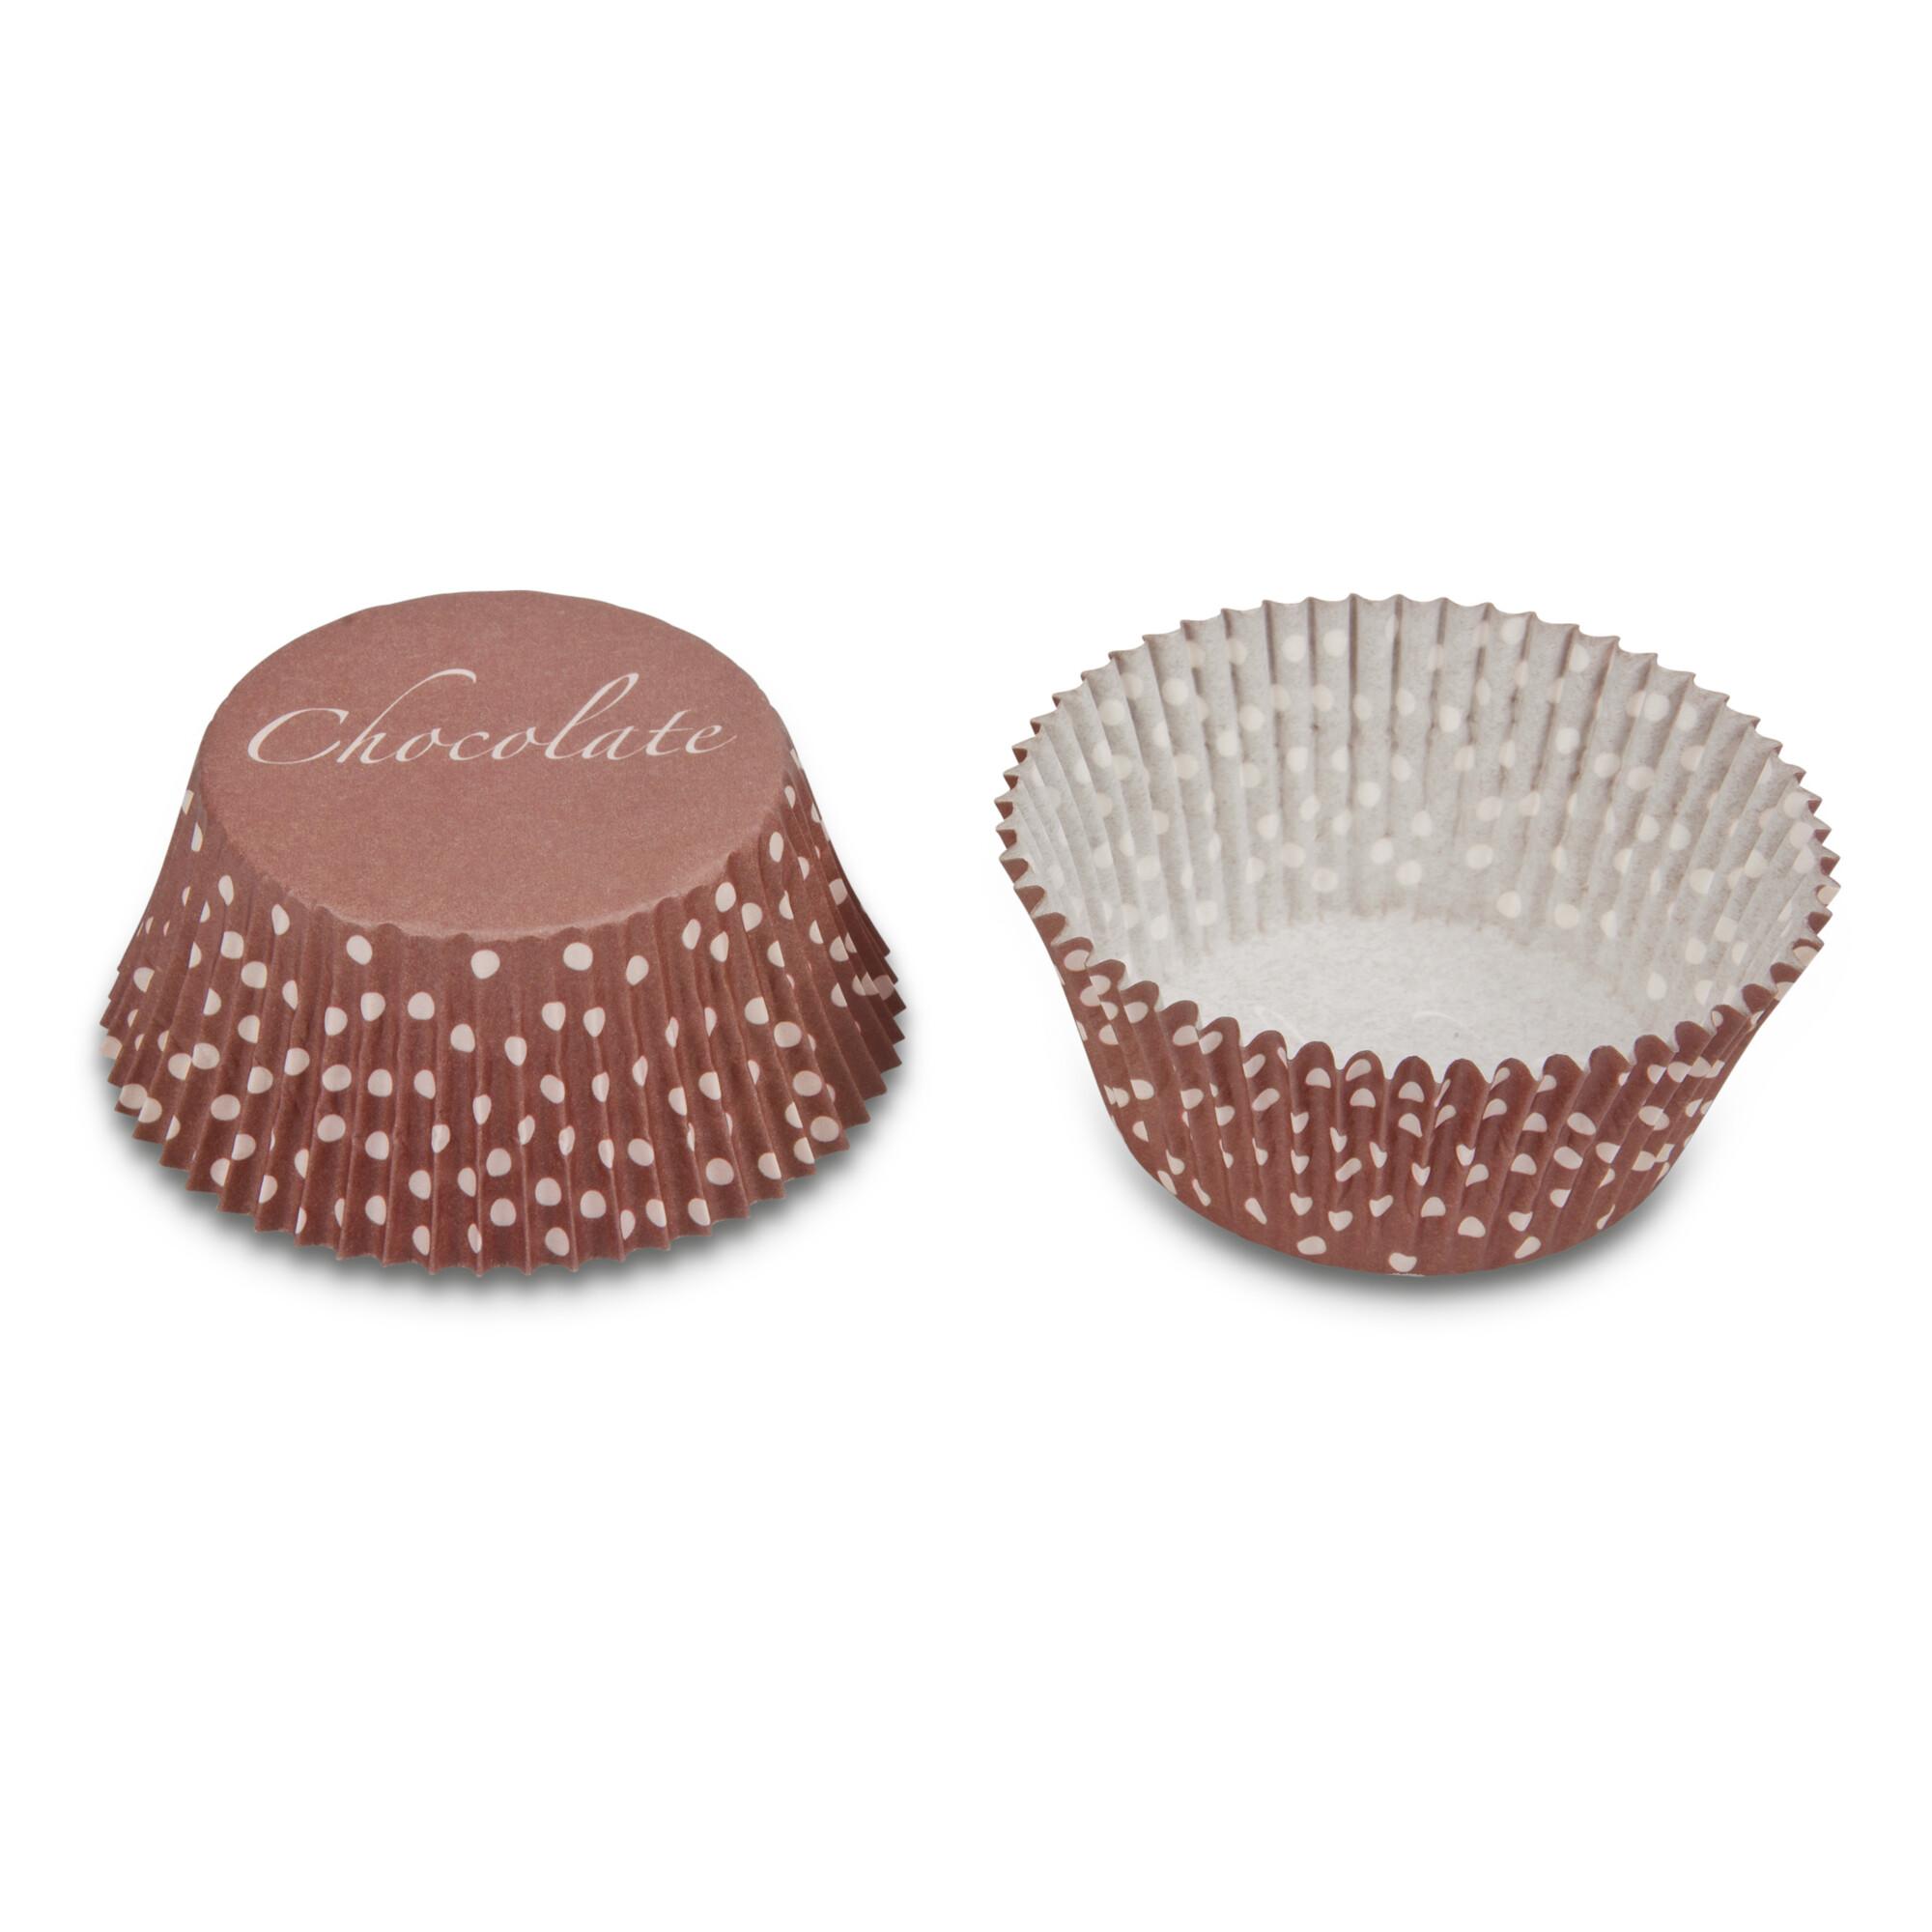 Papier-Backförmchen – Chocolate – 50 Stück